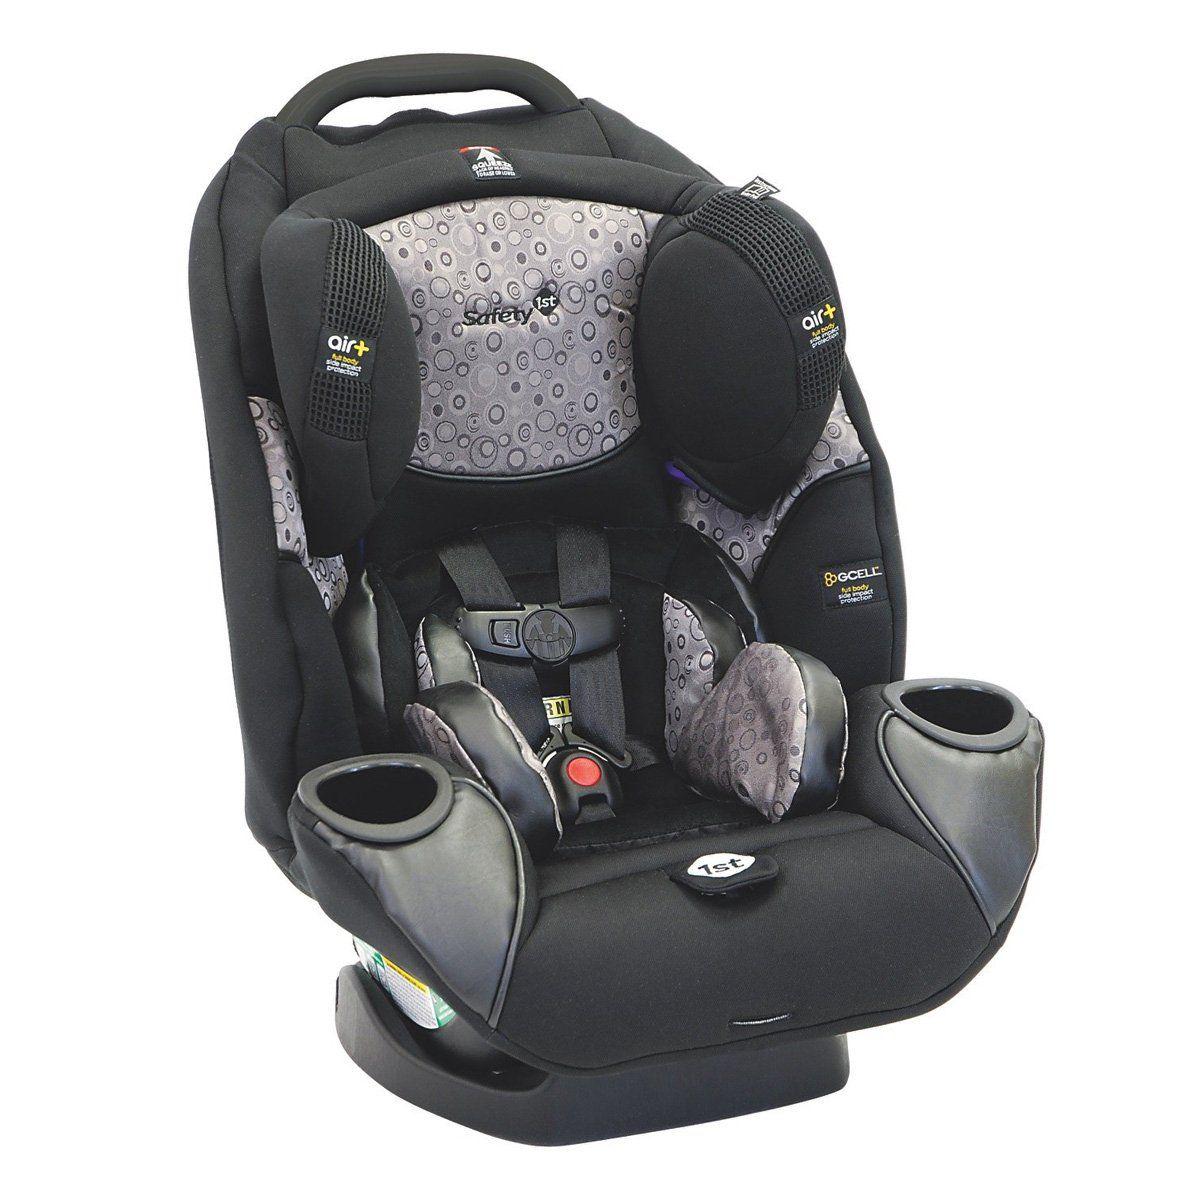 Safety 1st elite air 65 plus galileo baby car seats